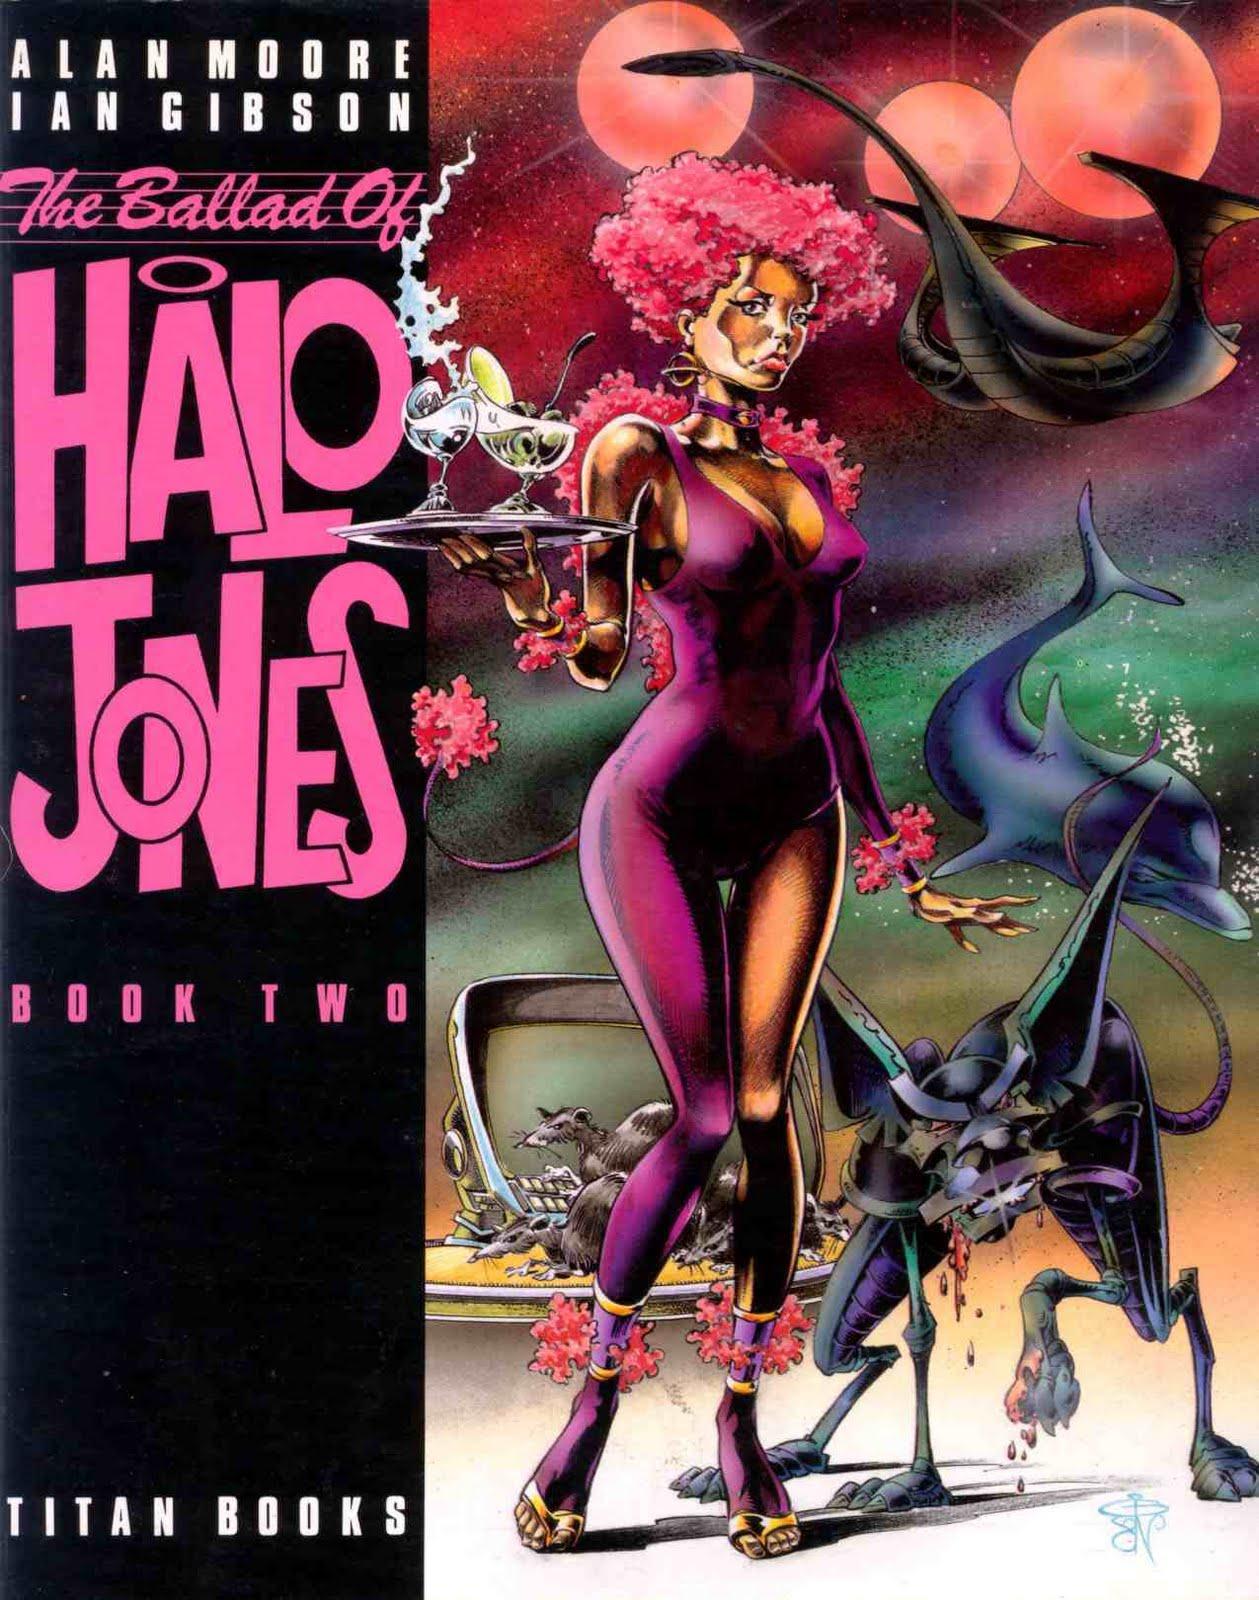 http://3.bp.blogspot.com/_HBKWtrKbYAk/S9K-PbQxq5I/AAAAAAAAExk/B1yM3DycT6Y/s1600/Ballad+of+Halo+Jones+Book+%232.jpg